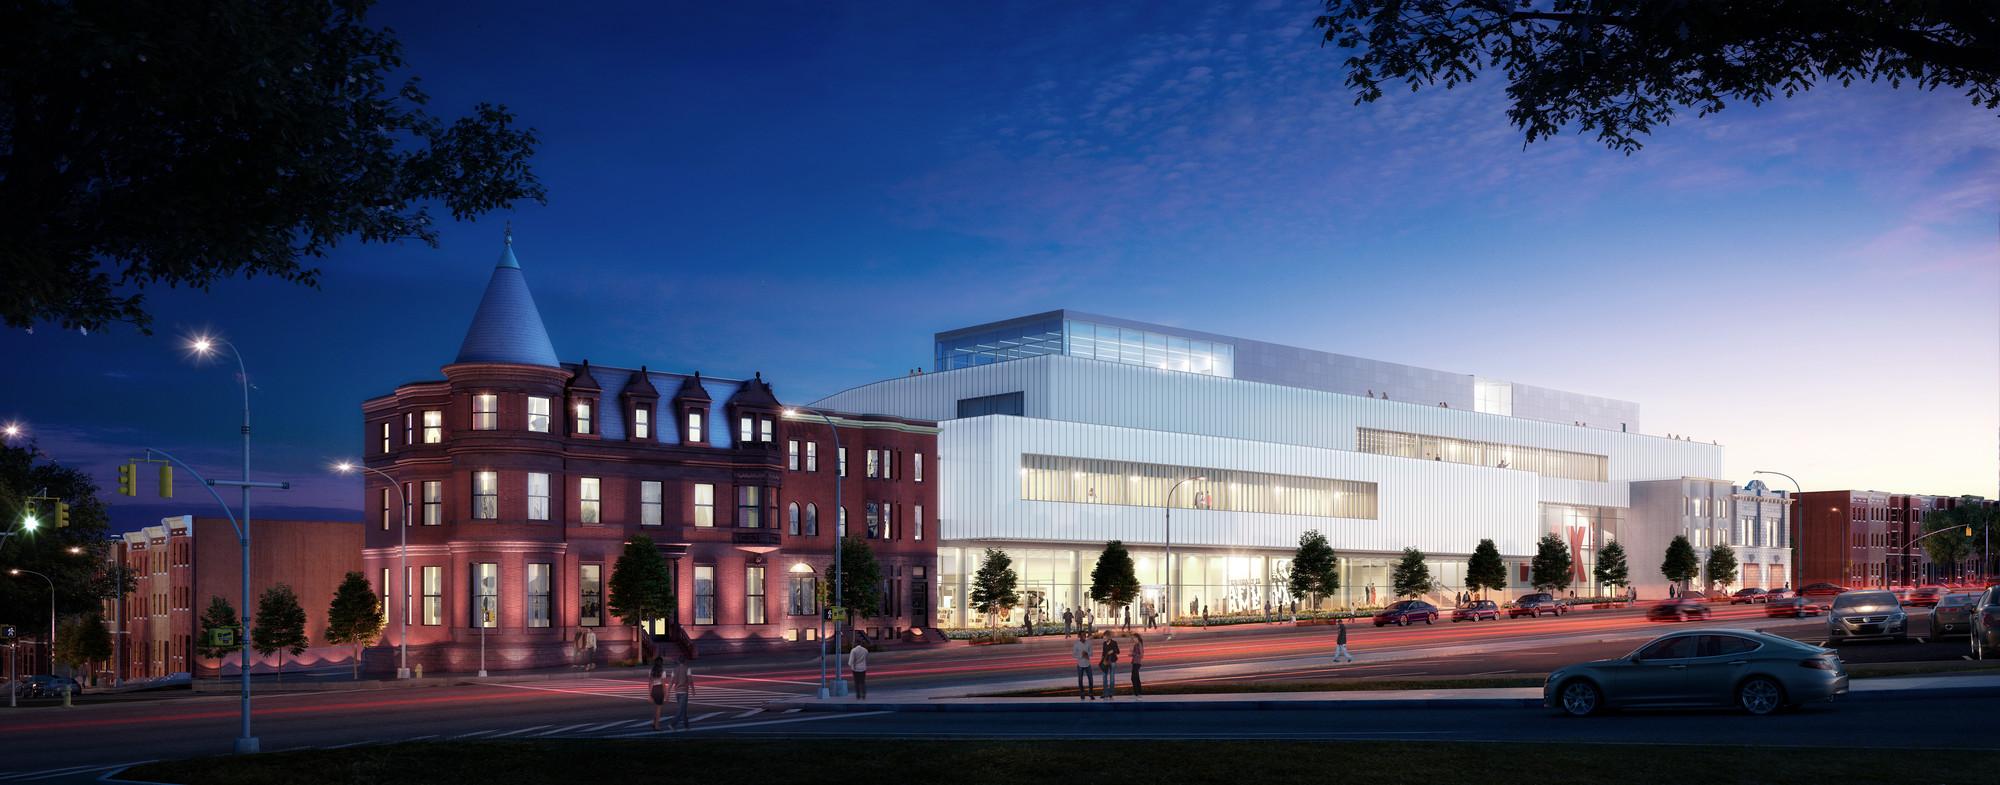 Davis Brody Bond to Expand Baltimore's National Great Blacks in Wax Museum, © Davis Brody Bond